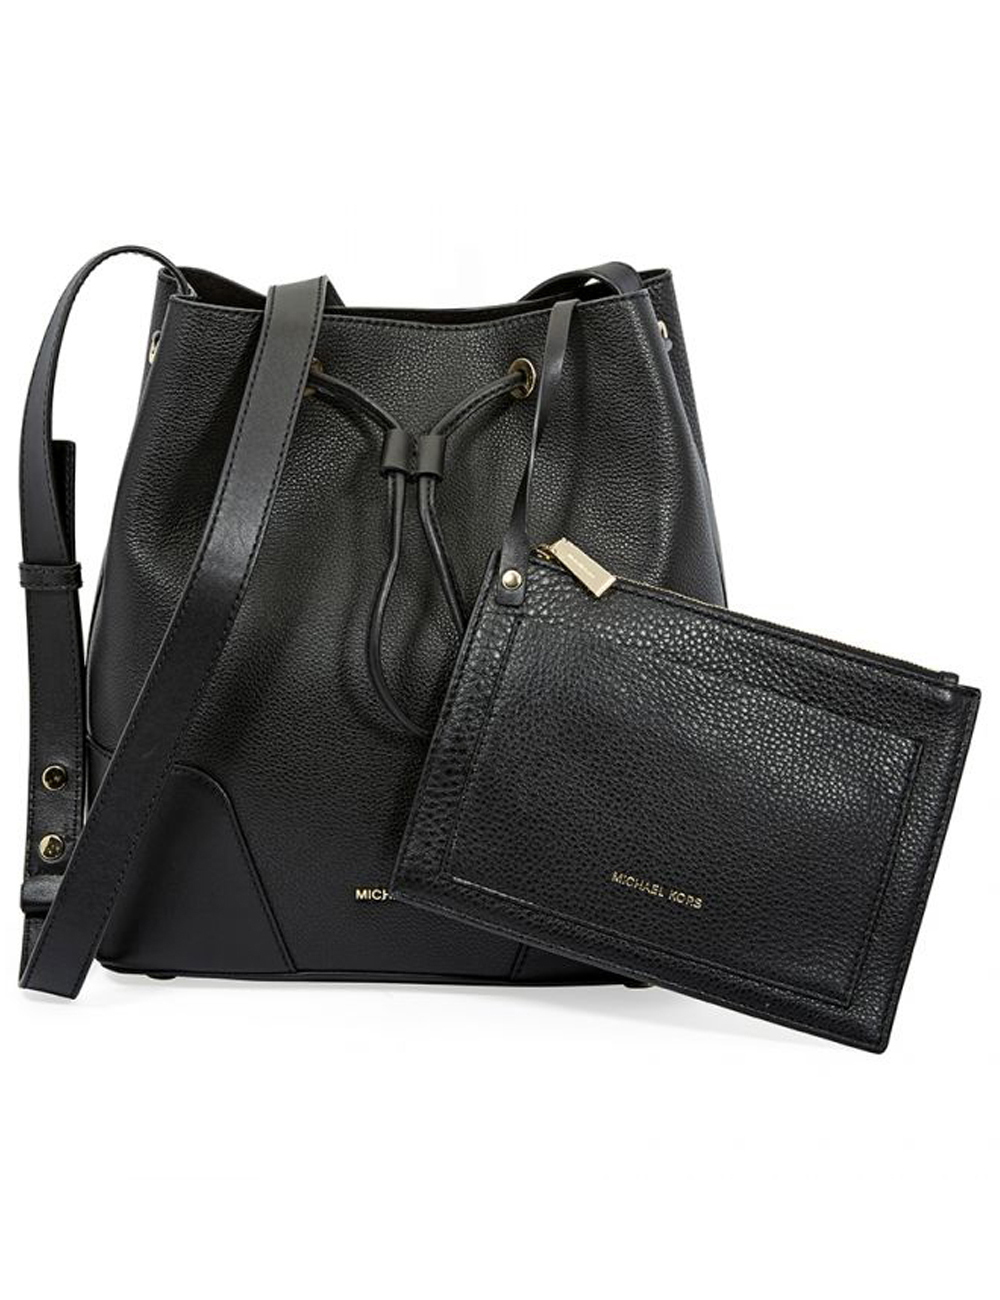 Leder Handtasche Bucket Bag Von Michael Kors Schwarz